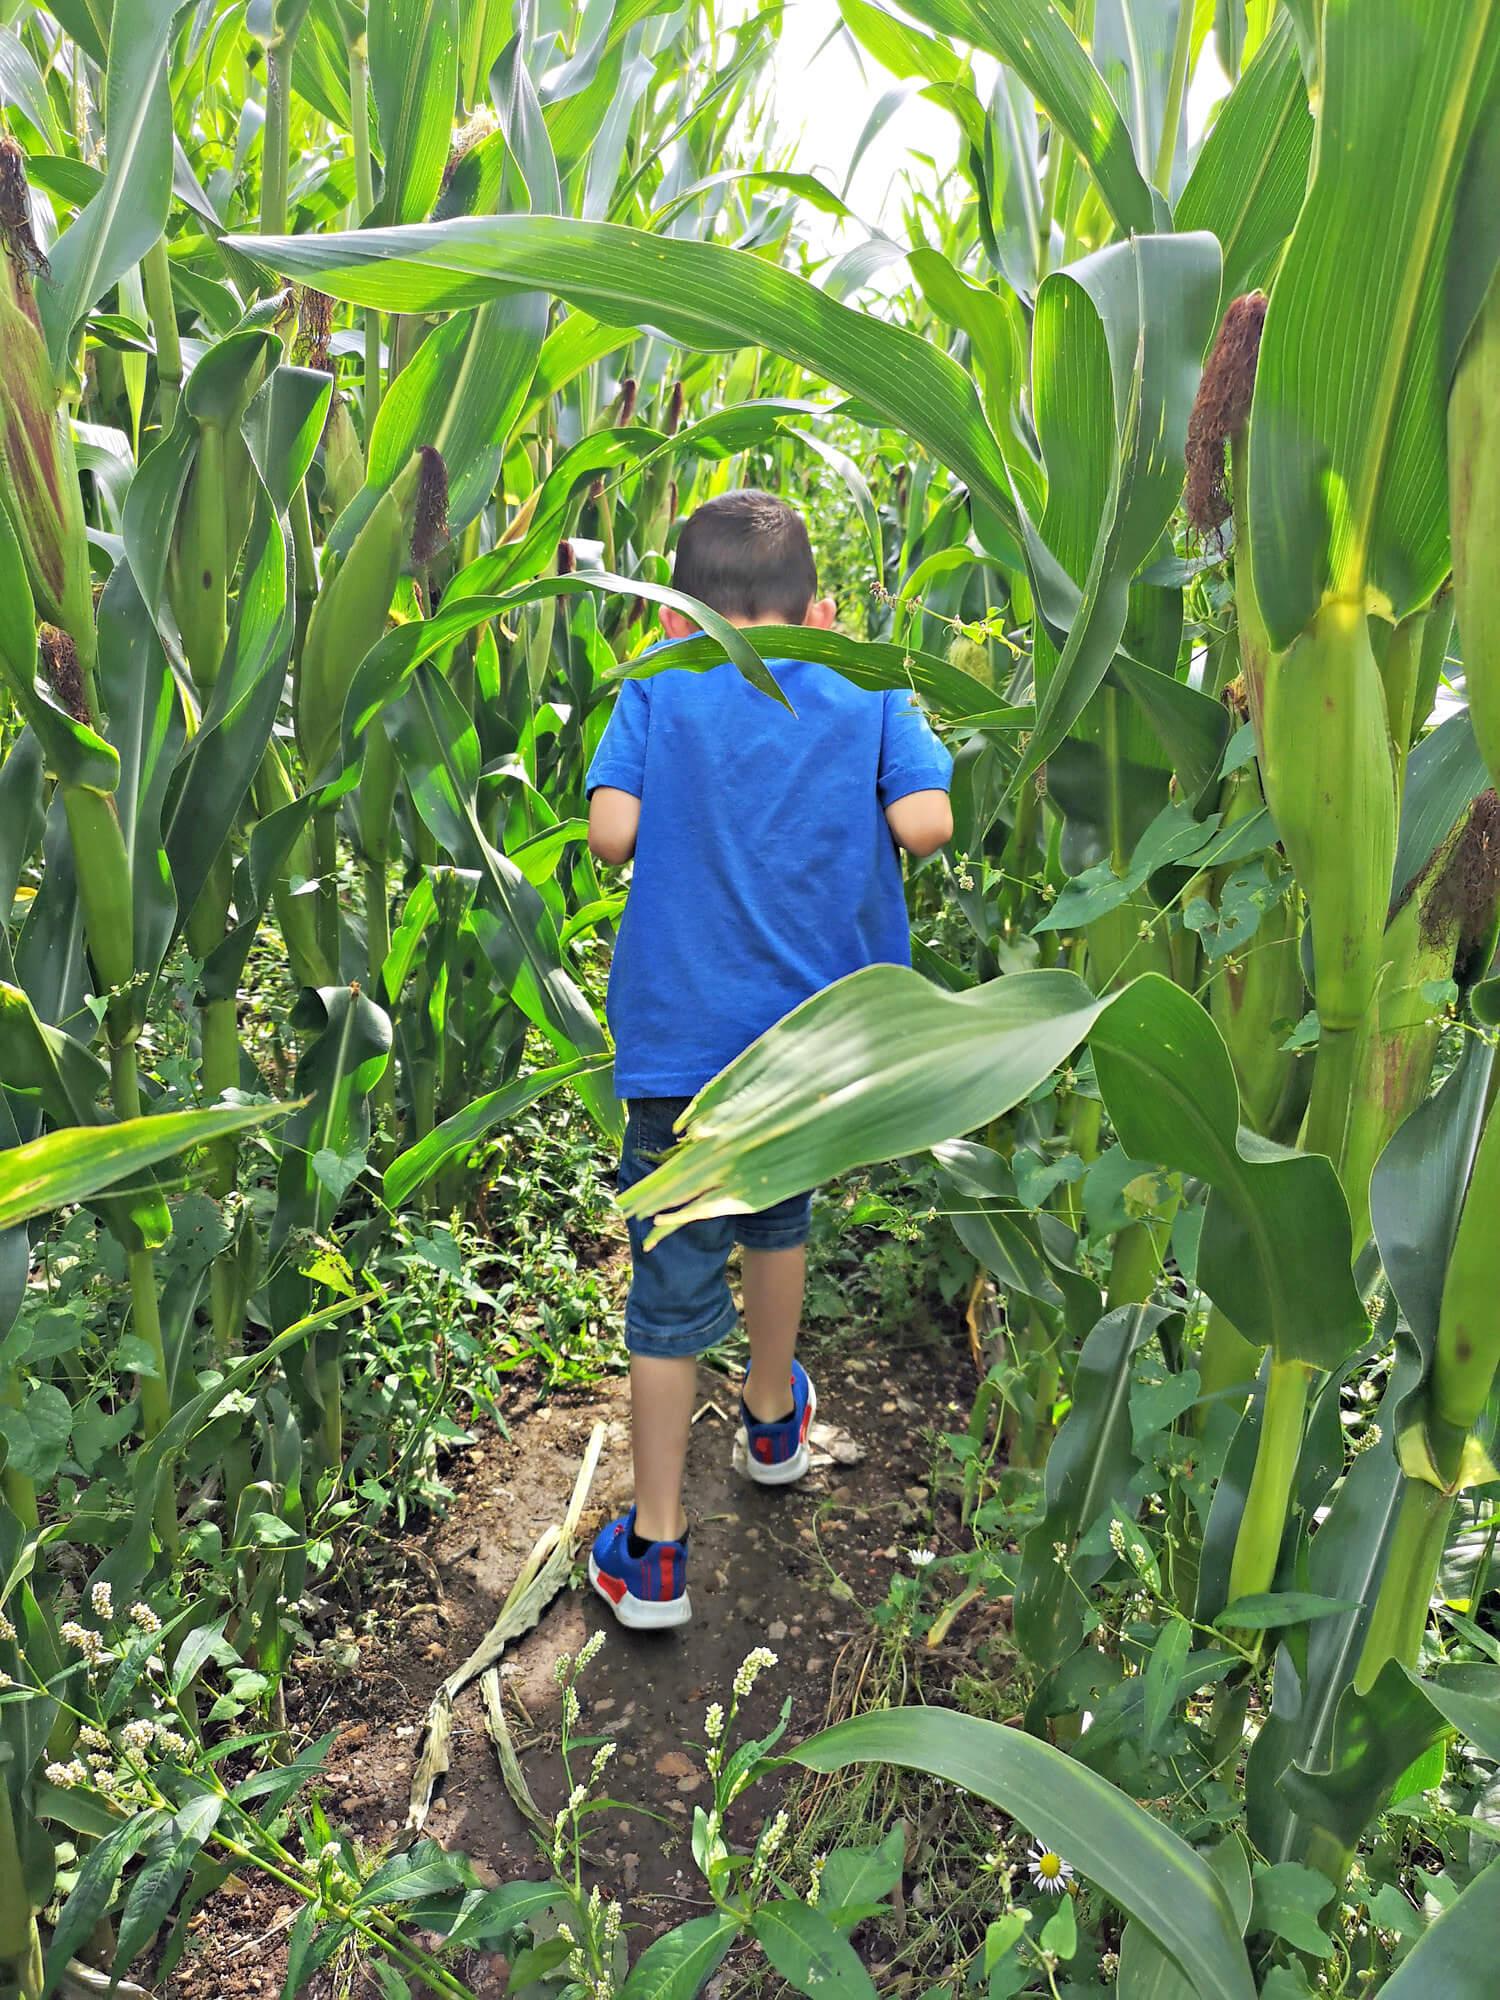 Emma's nephew walking through the corn paths.